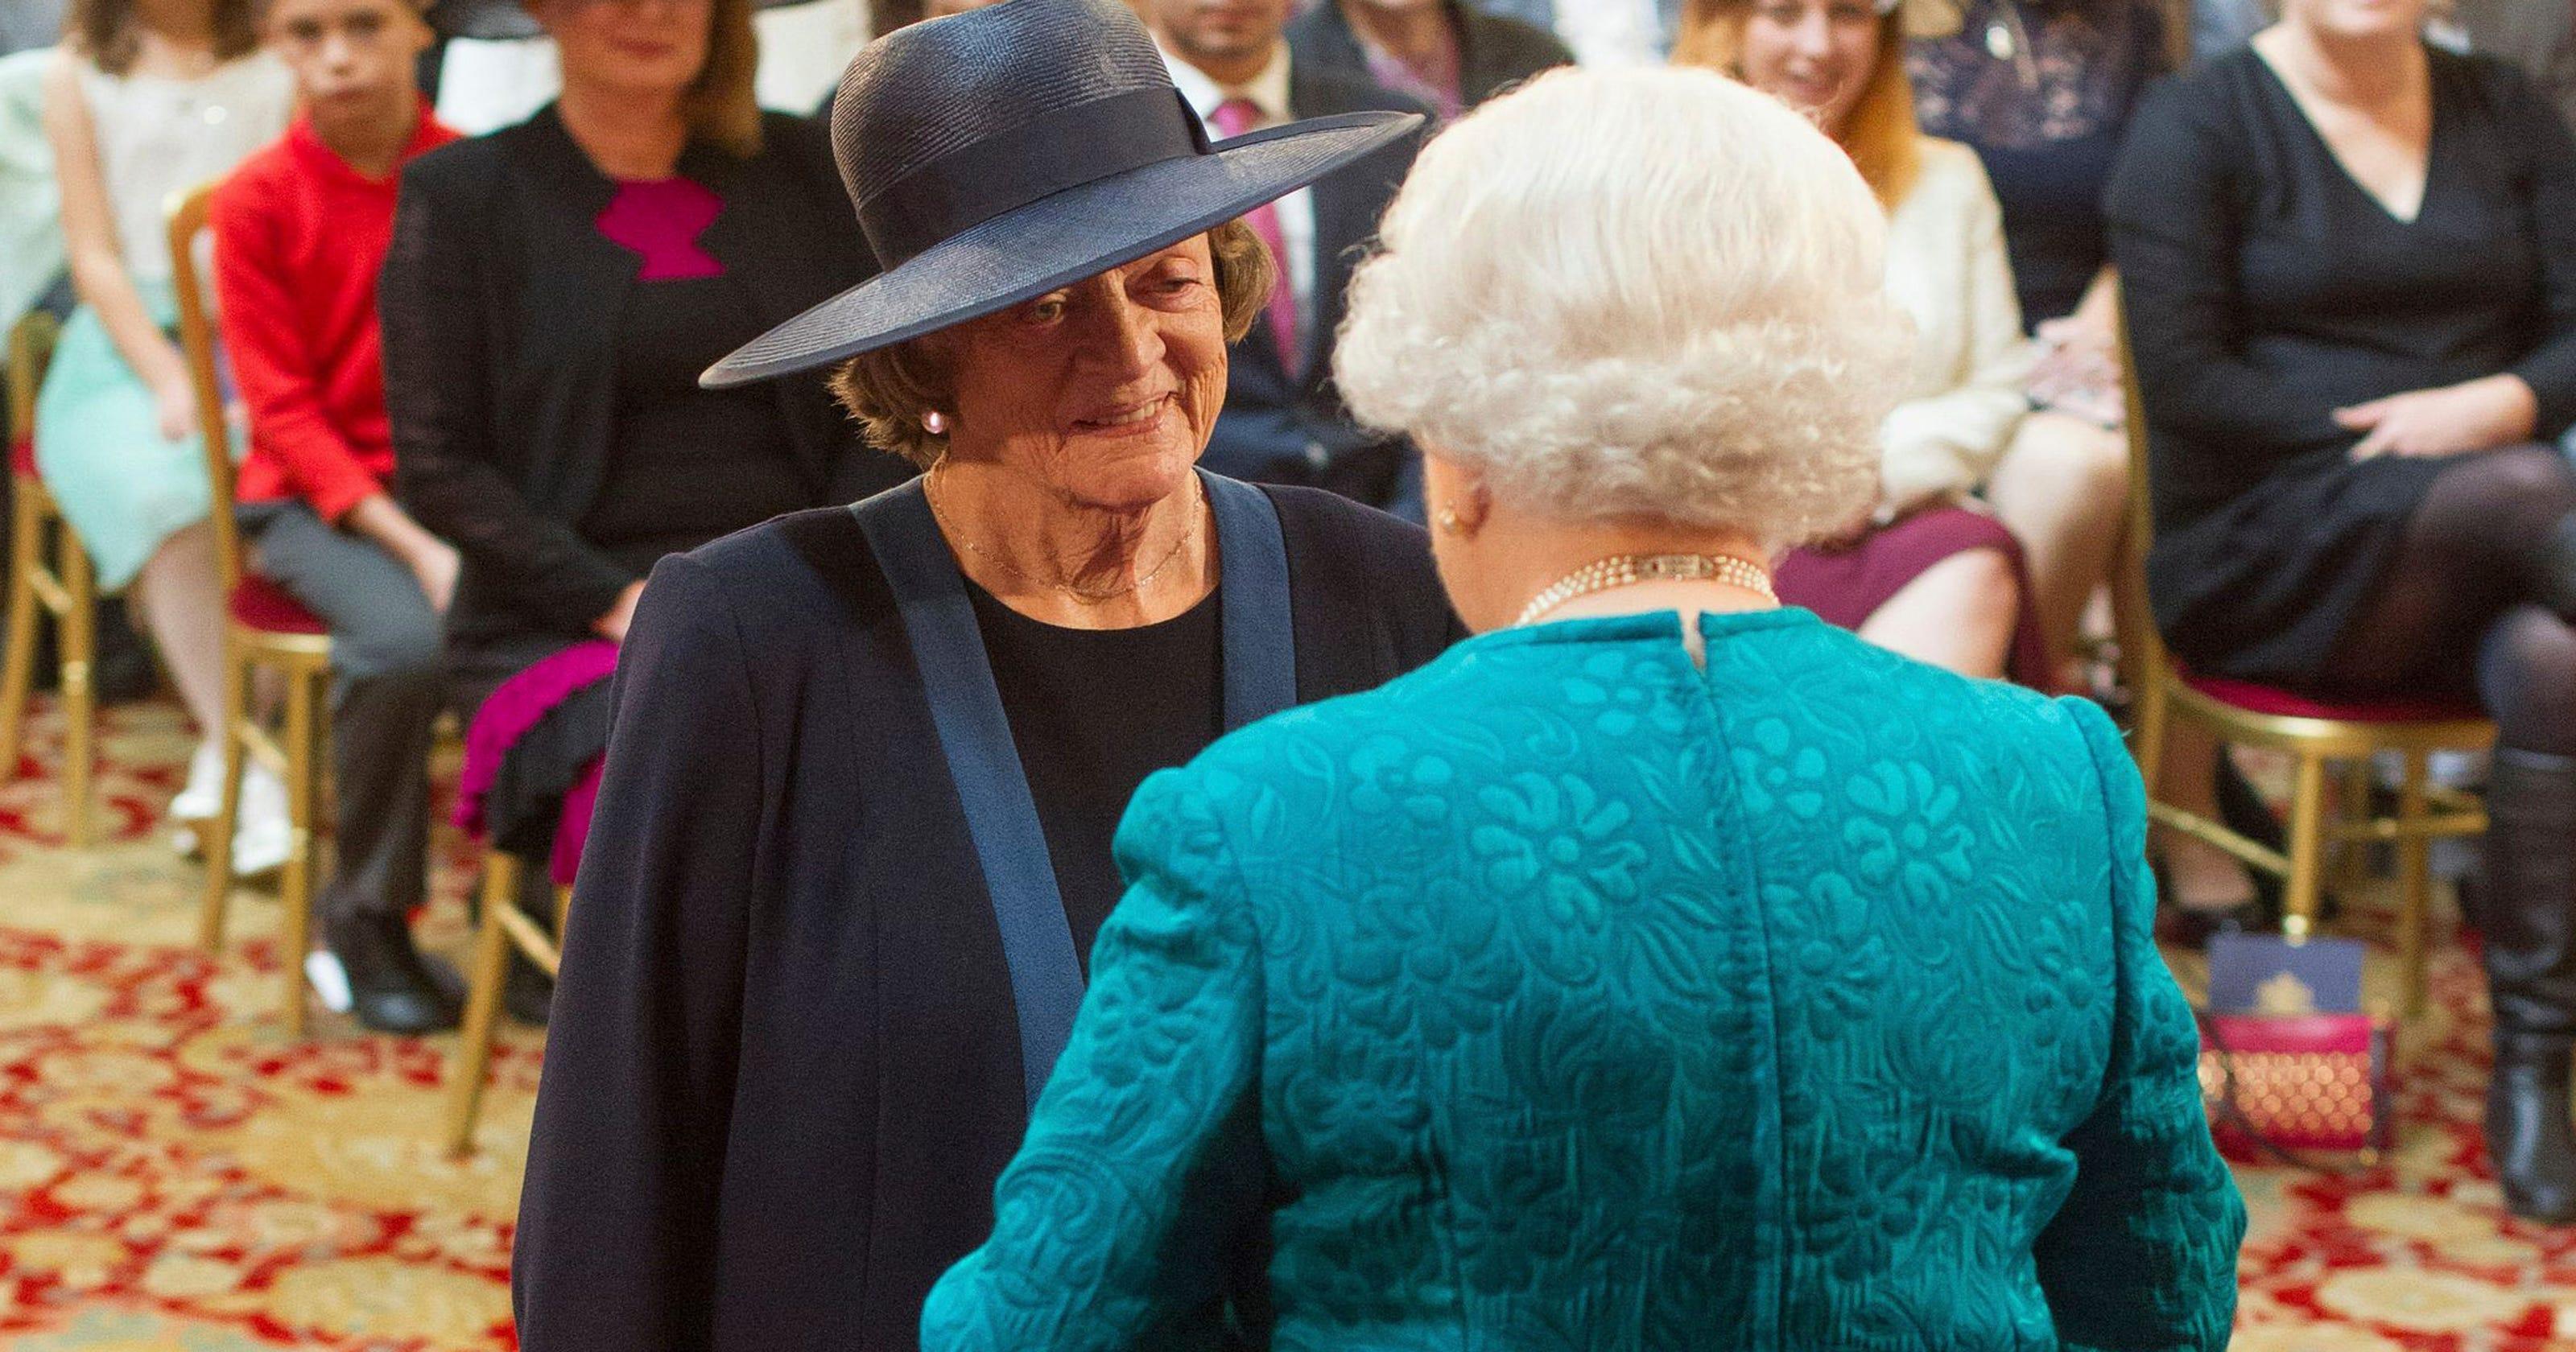 queens honour nominations - HD2069×1369